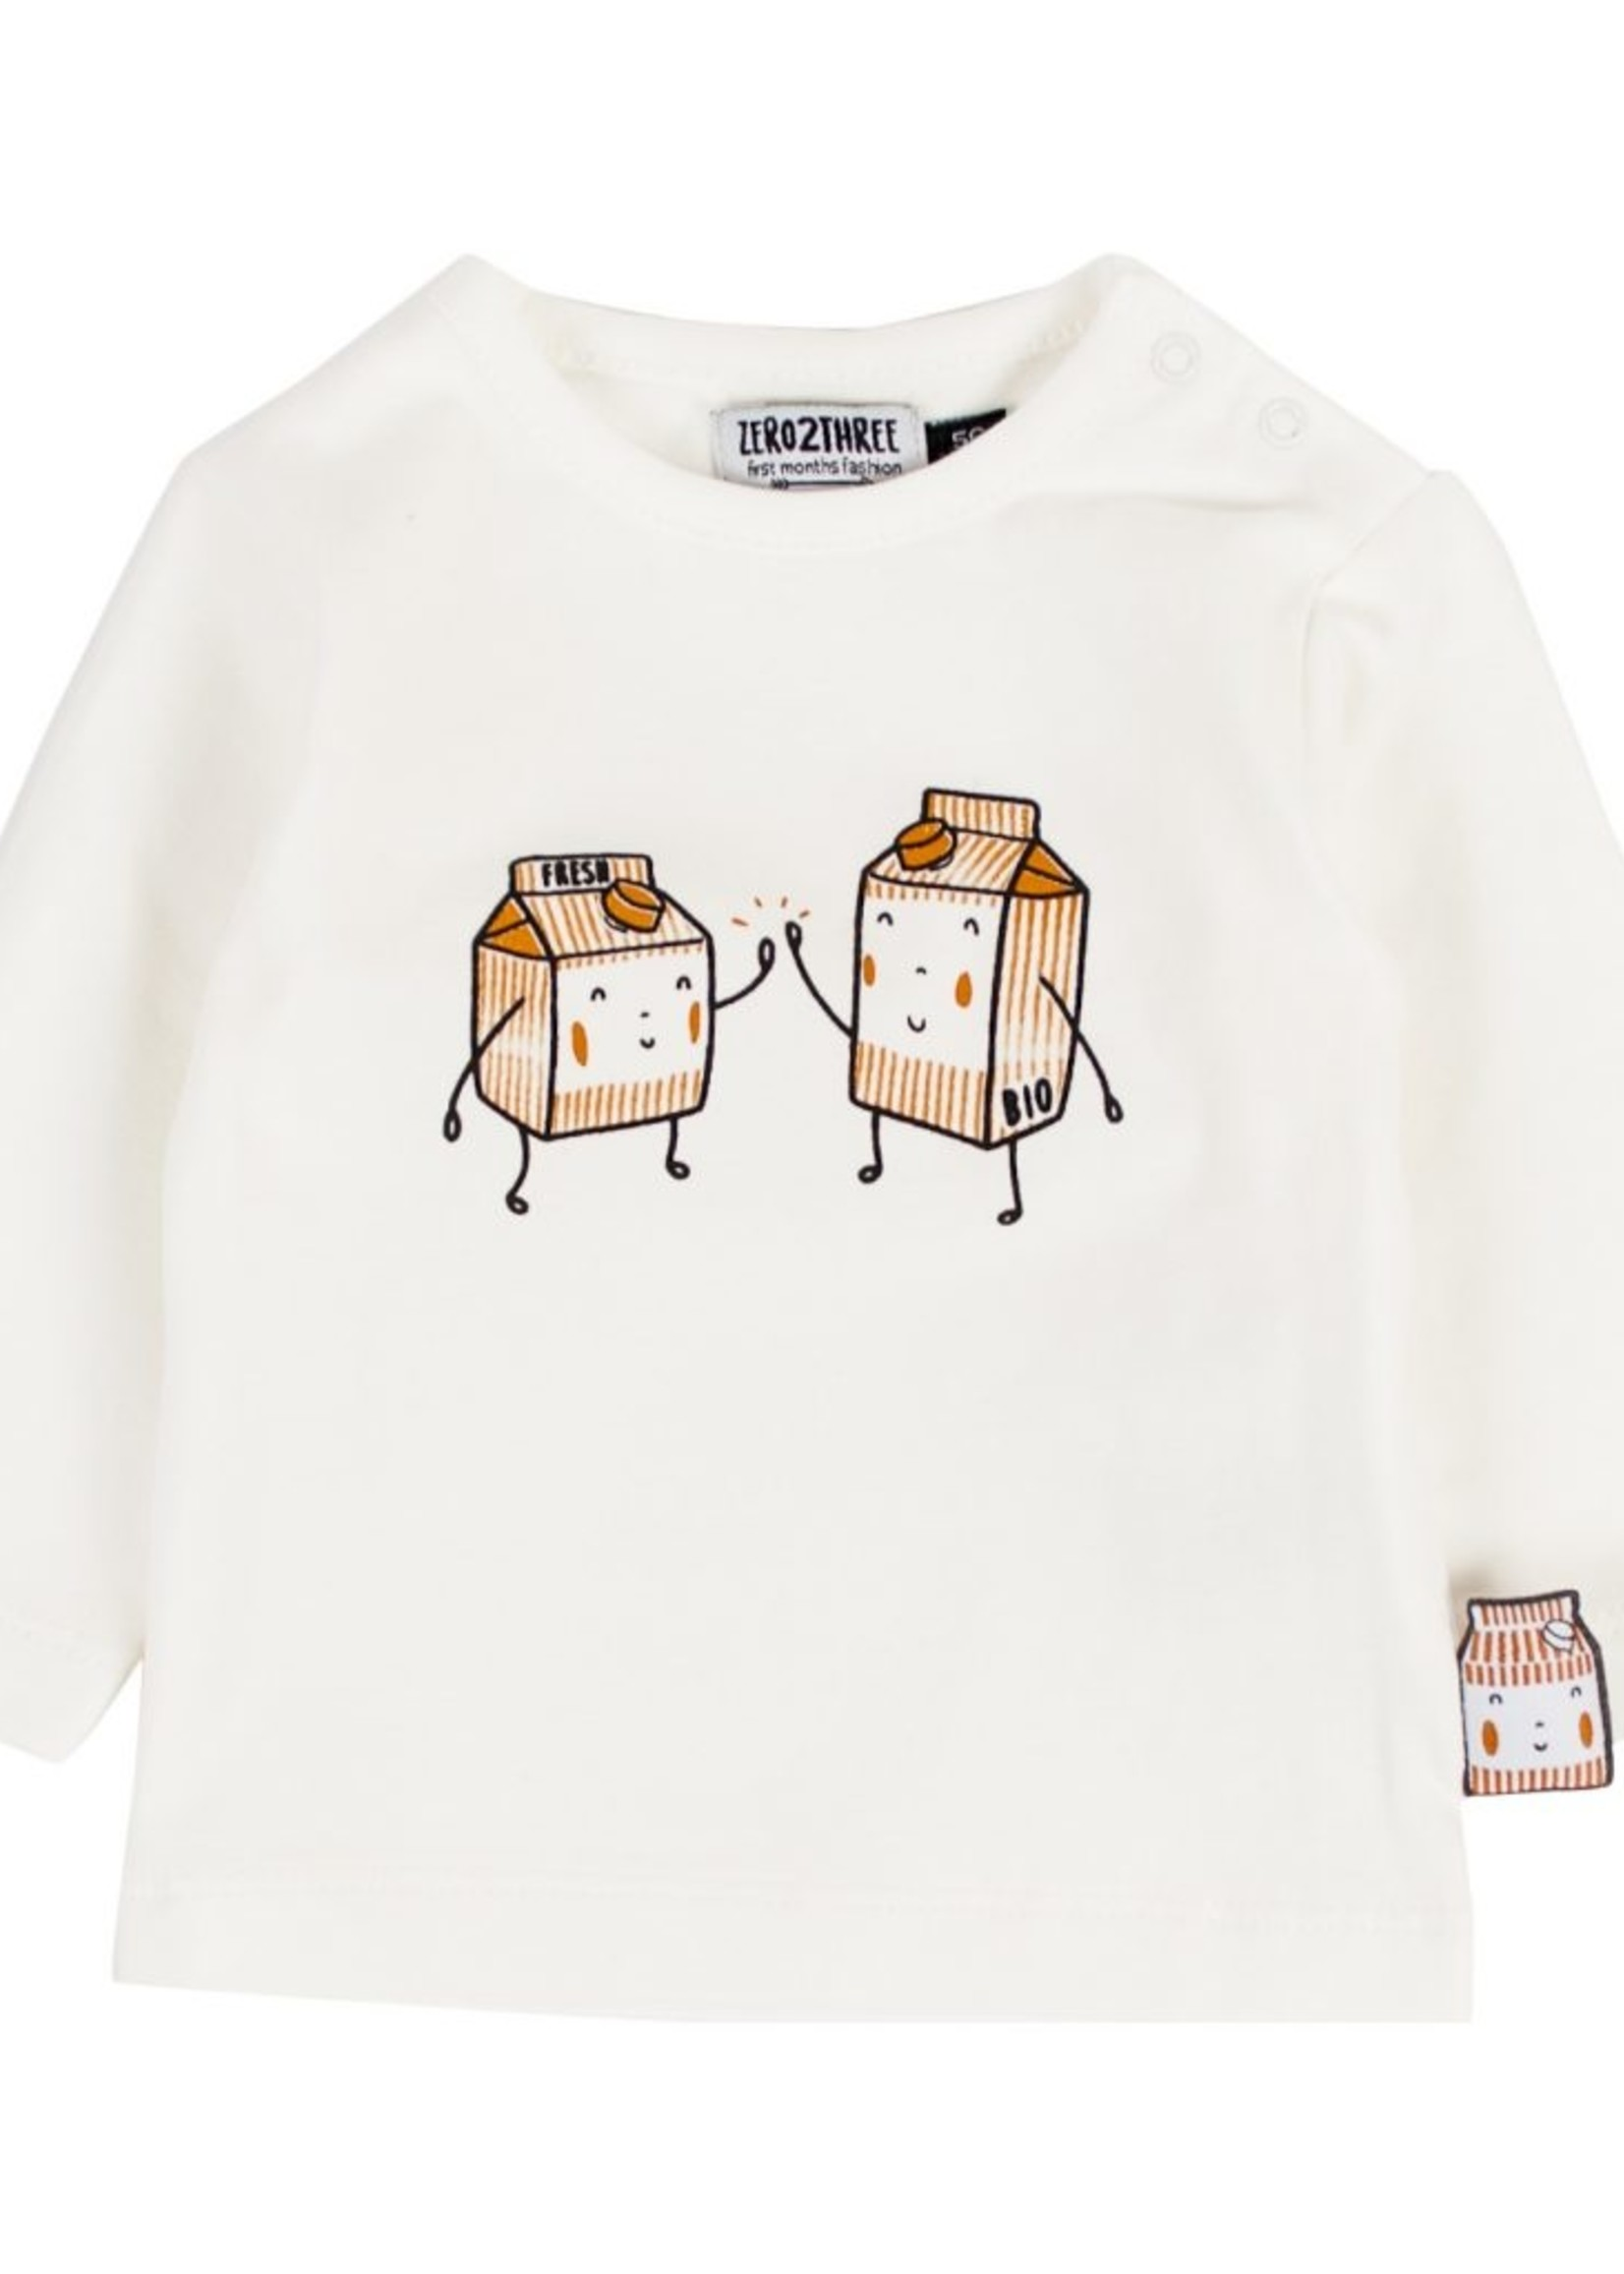 Zero2three Zero2three tshirt 8E039